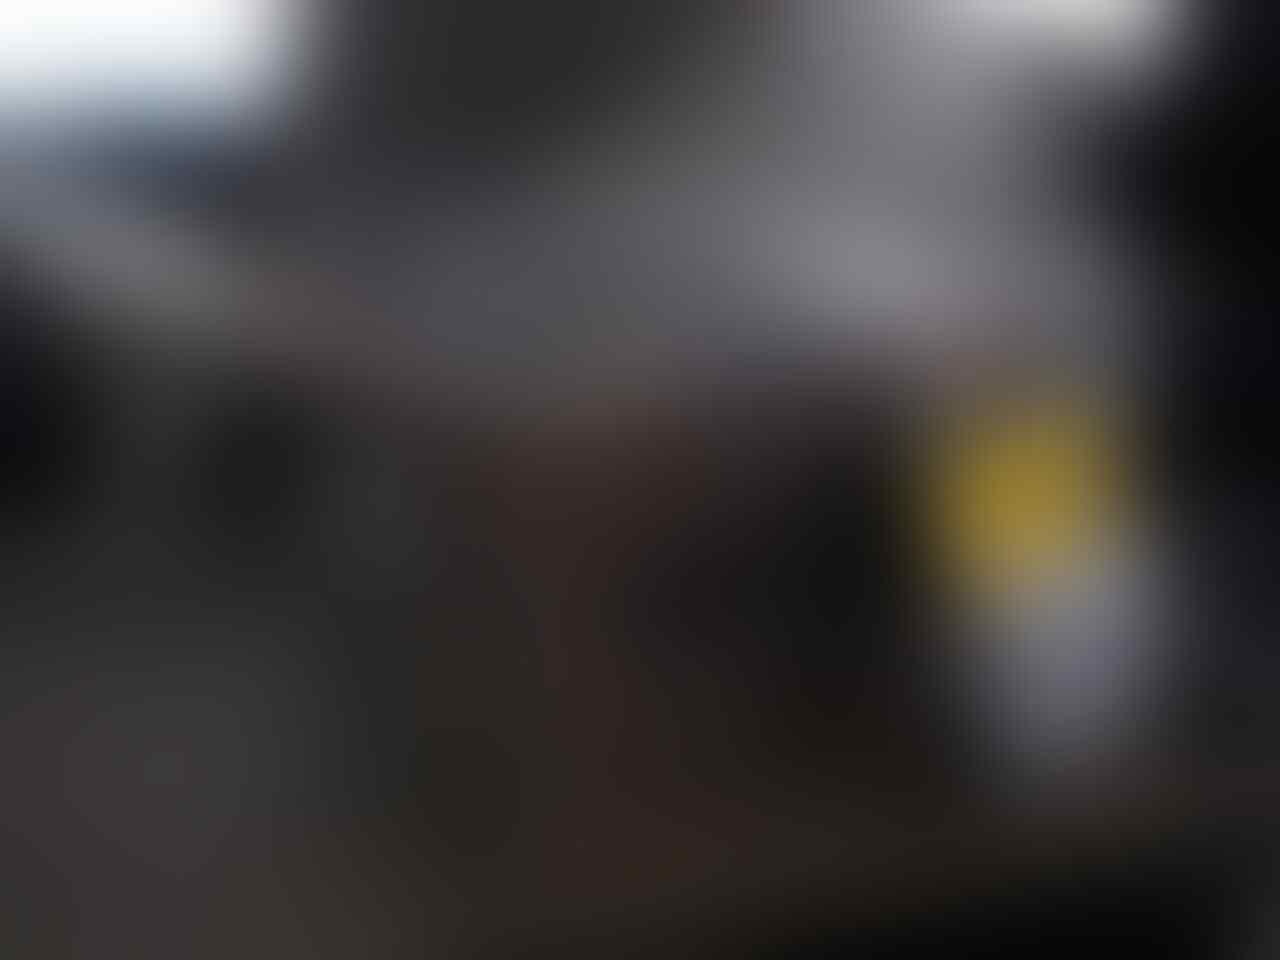 JUAL BATERAI AGBP012-A001 ORIGINAL UNTUK SONY XPERIA T2 ULTRA BERGARANSI